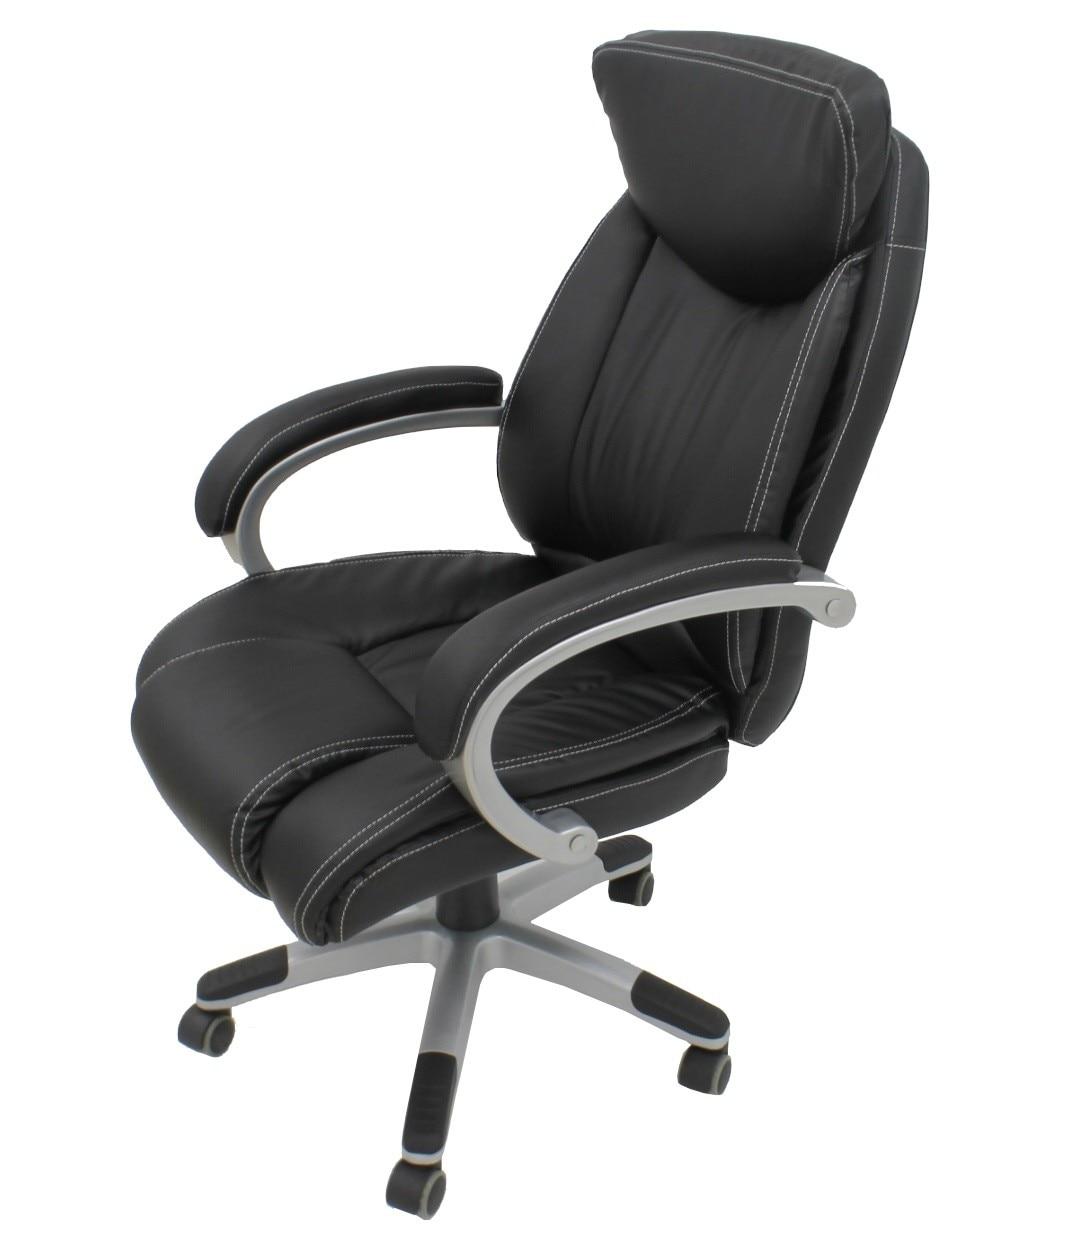 Office Armchair ALPHA, High, Gas, Tilt, Similpiel Black